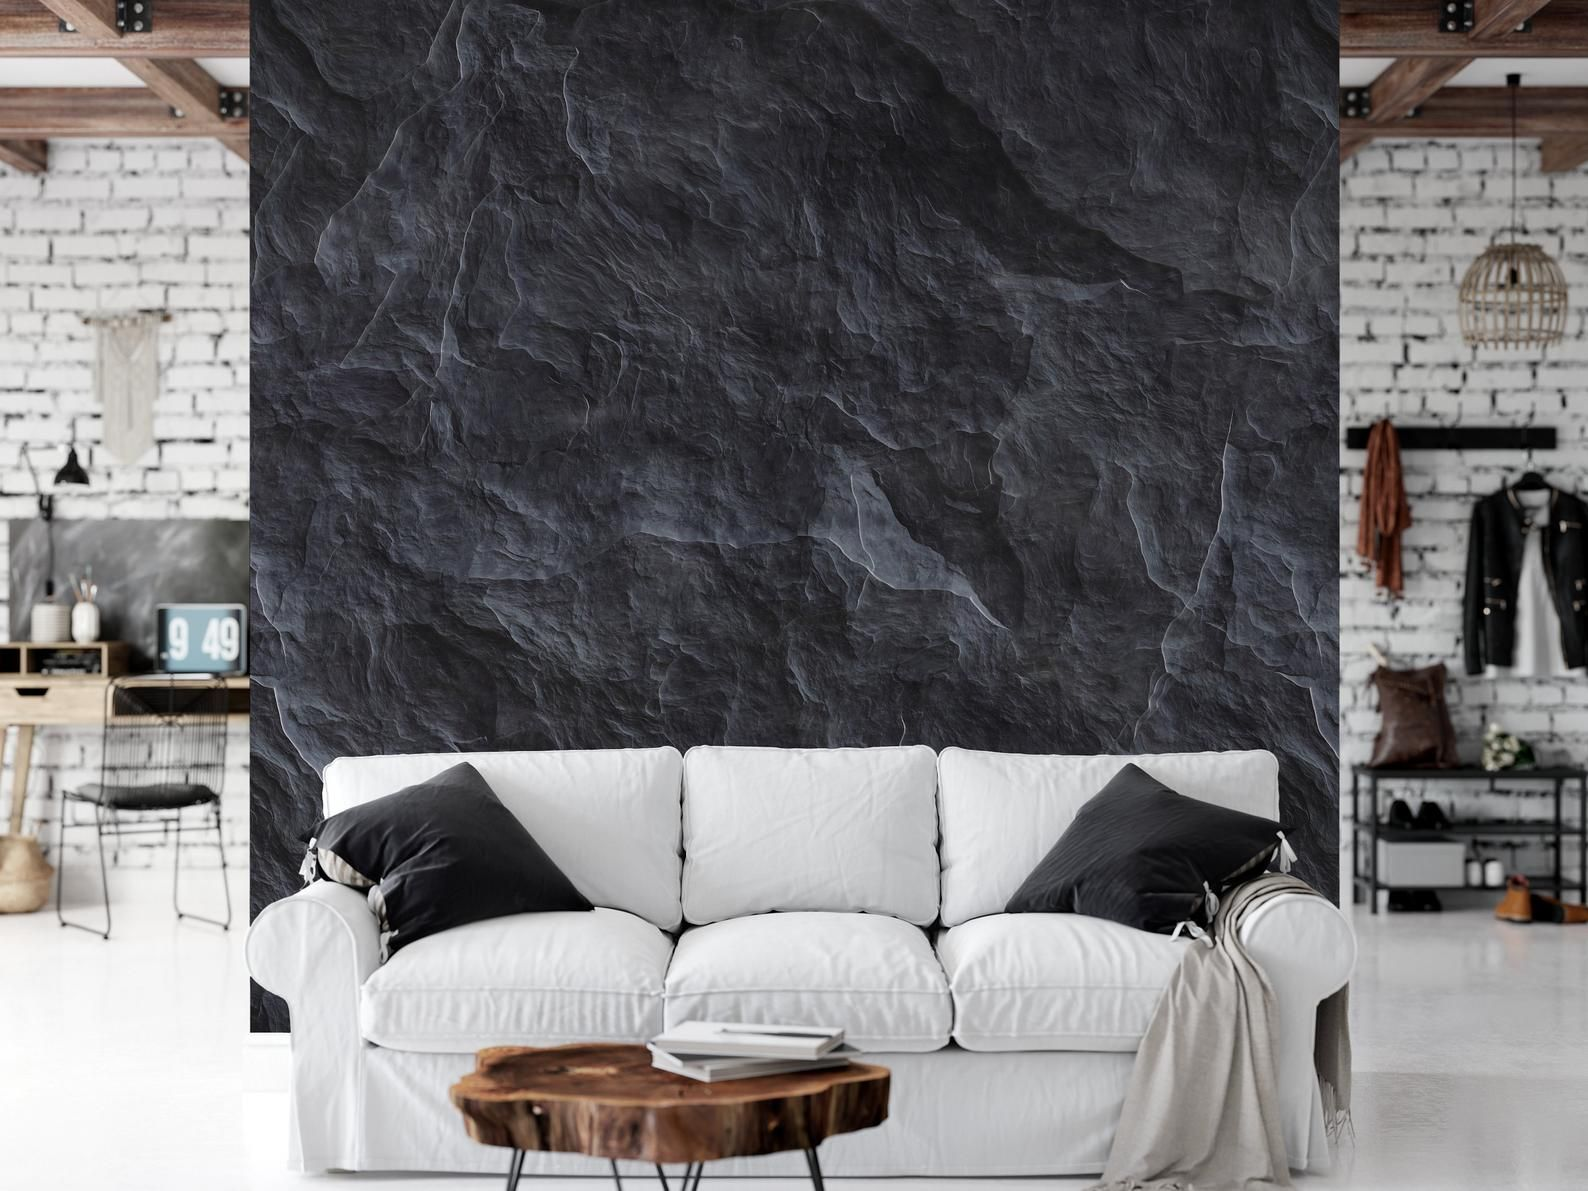 Black Marble Wallpaper Peel And Stick Marble Wallpaper Precious Marble Mural Living Room Mural Marble Scandinavian Black Stone Marble Wall Mural Marble Wallpaper Living Room Bedroom